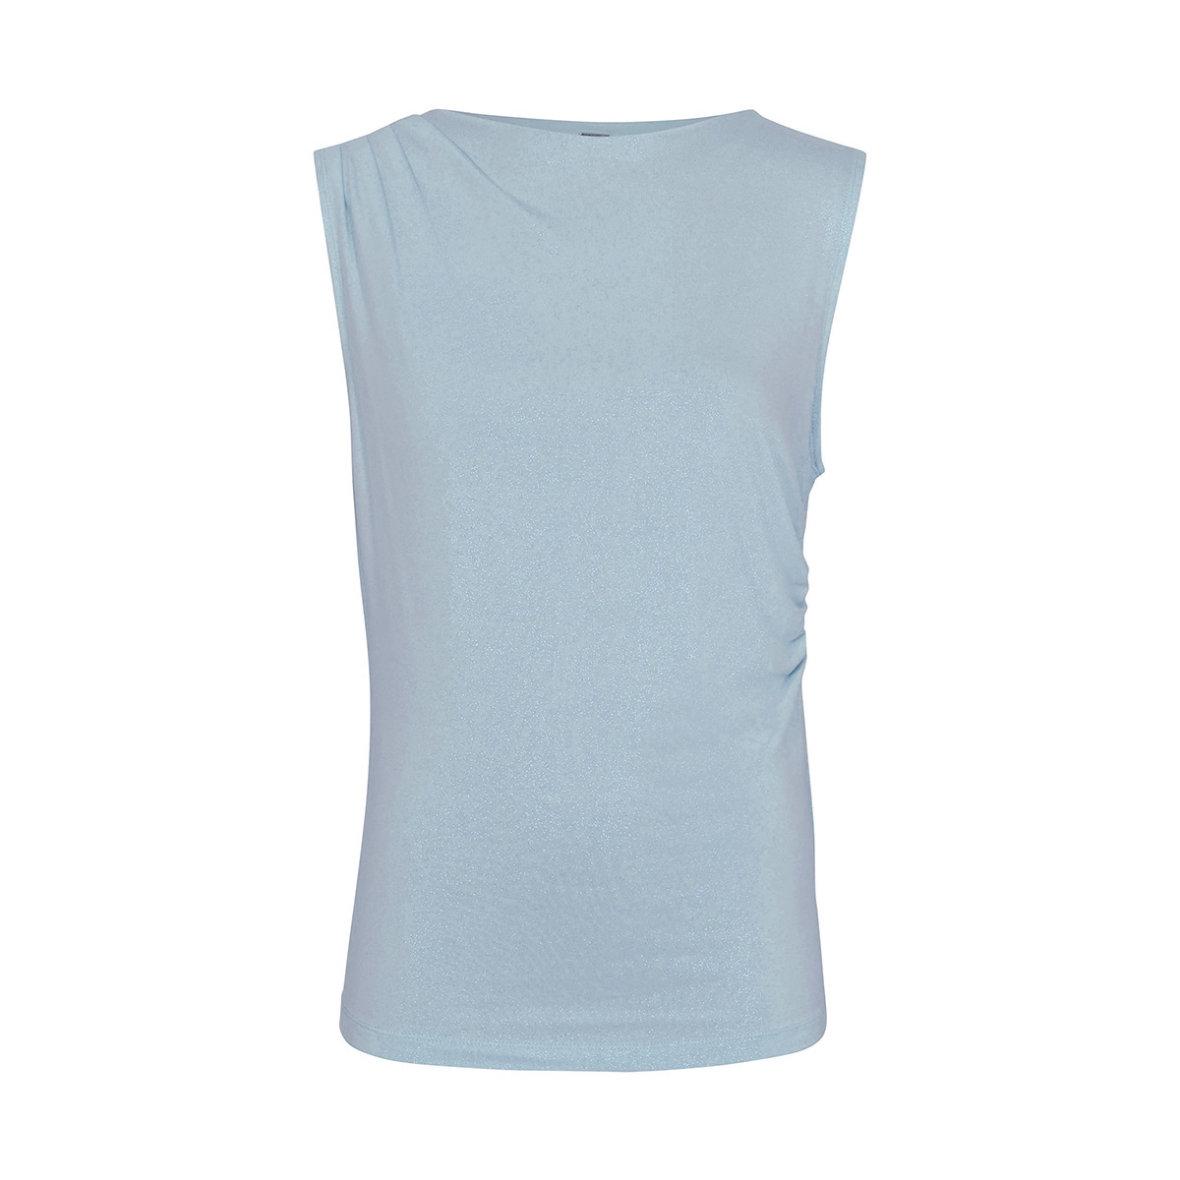 Blauwe dames top Gustav - 1561-0-9429